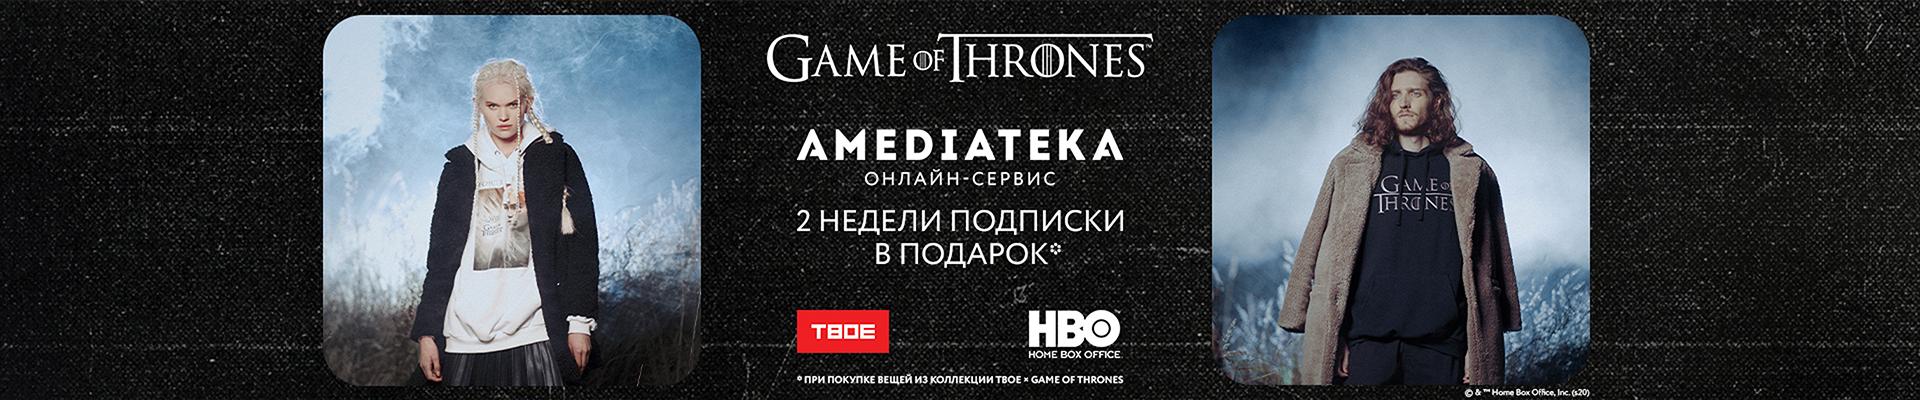 ТВОЕ Game of Thrones